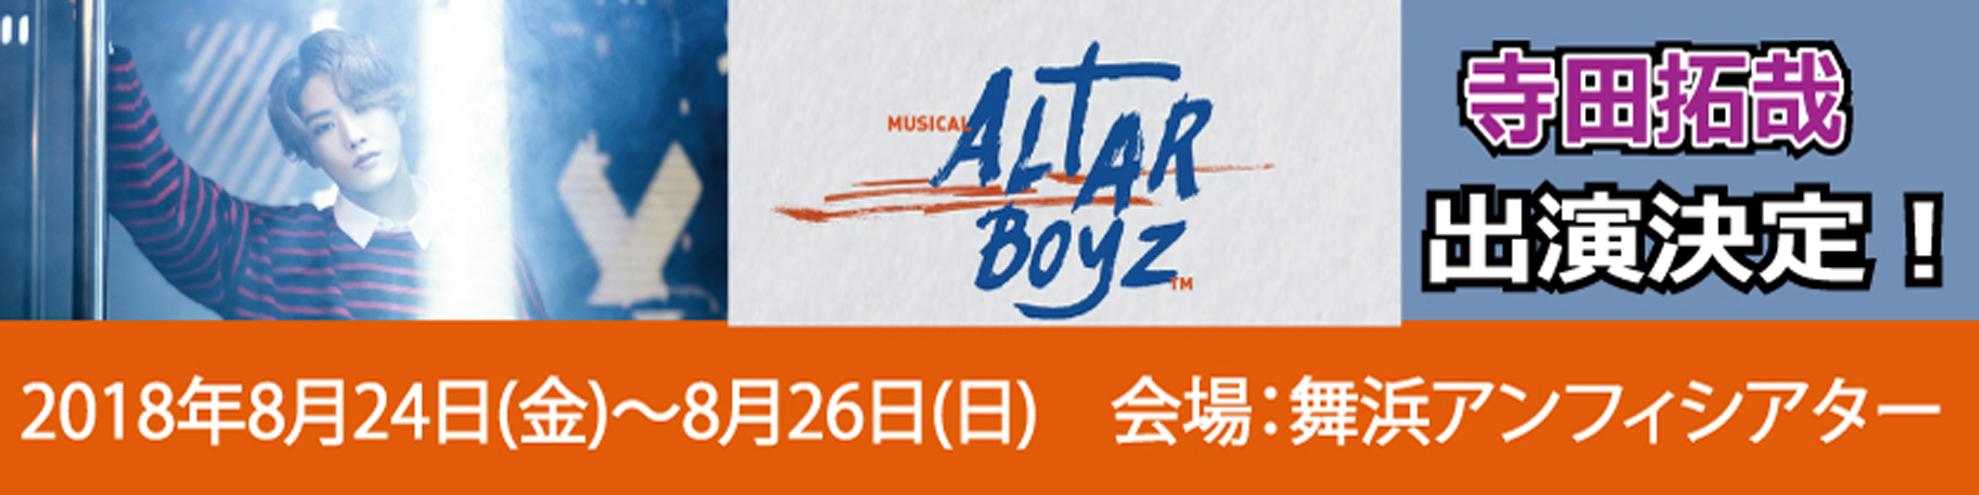 Alter-boys_2